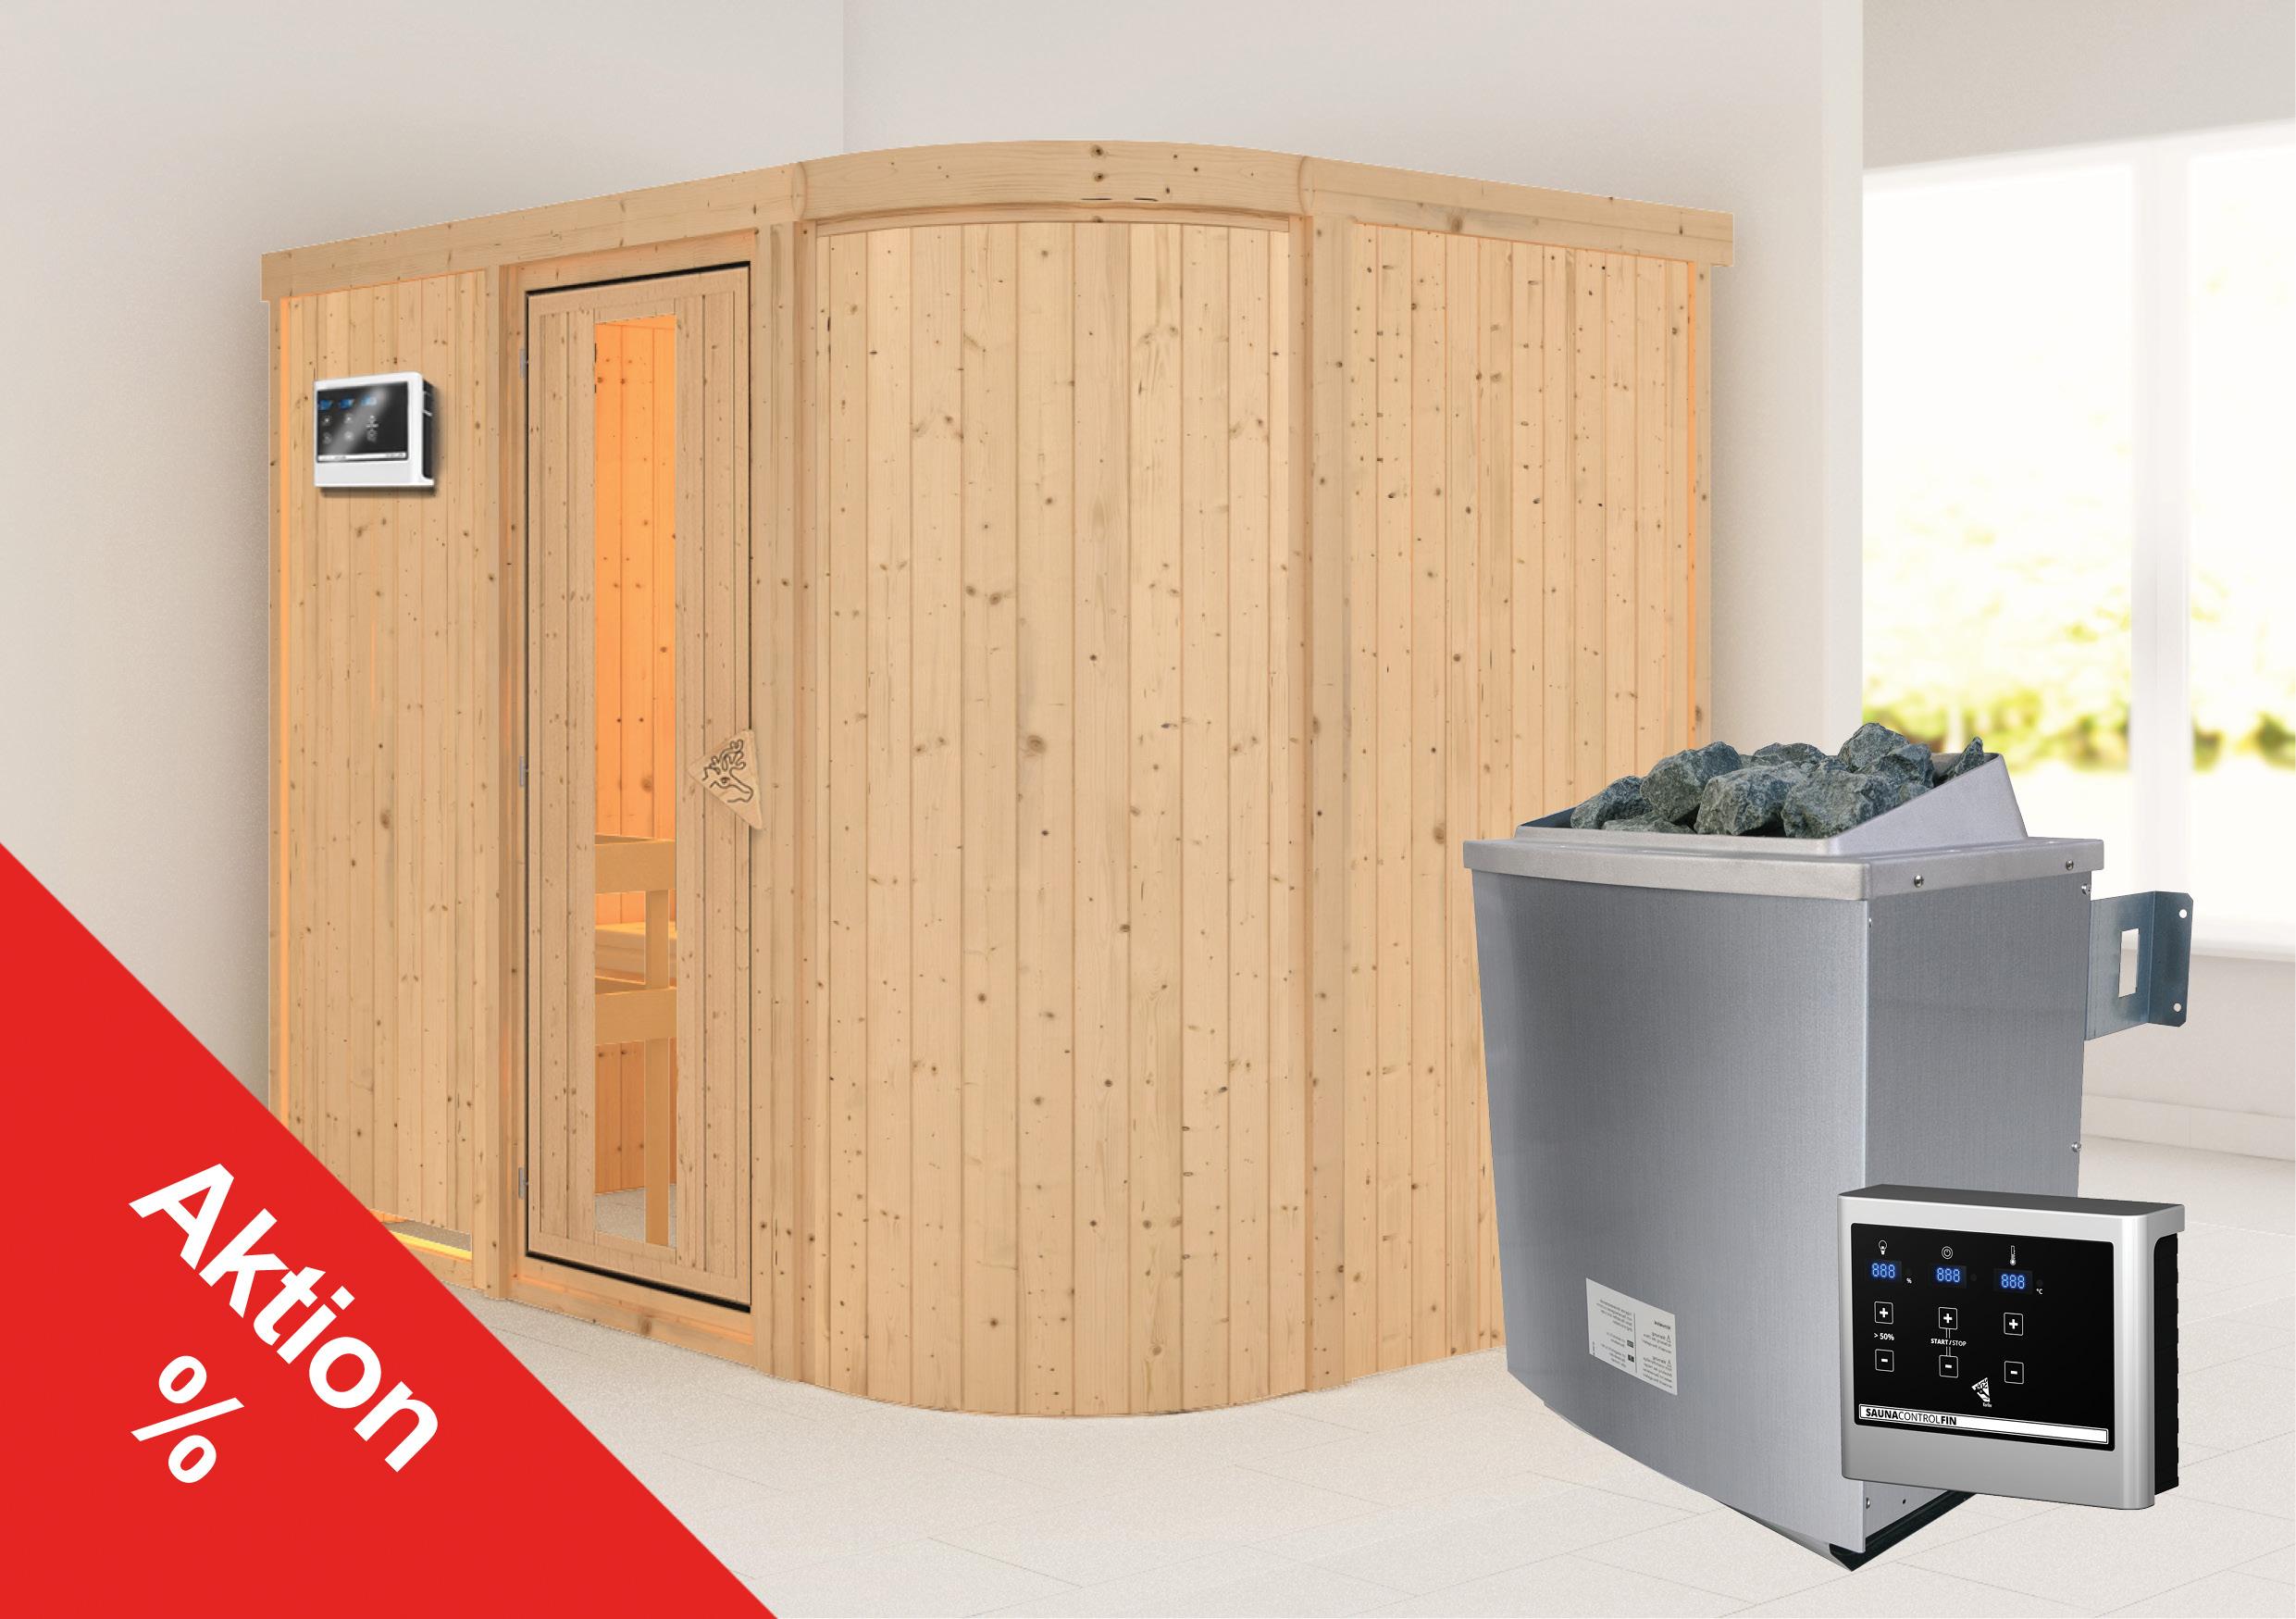 Karibu Sauna Sitania 68mm Saunaofen 9kW extern Tür Holz Aktion Bild 1